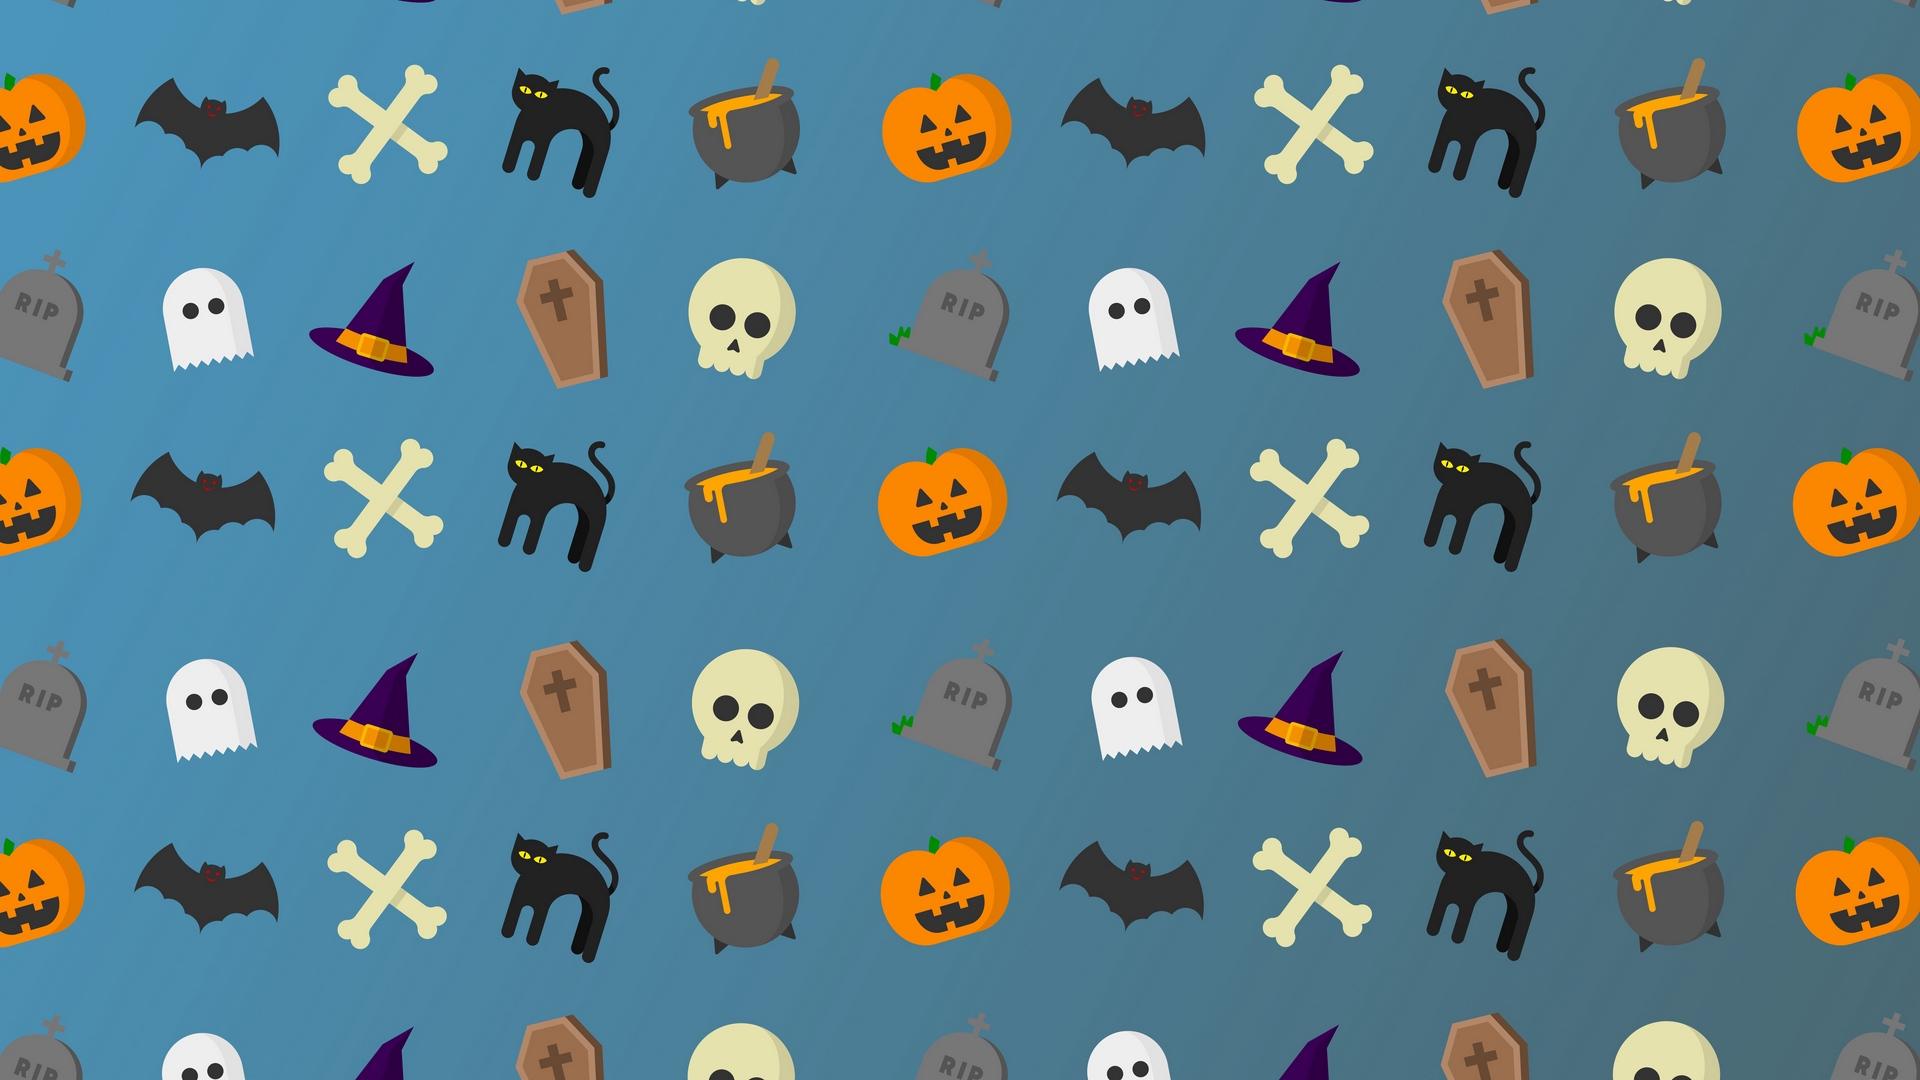 download wallpaper: Halloween clipart wallpaper